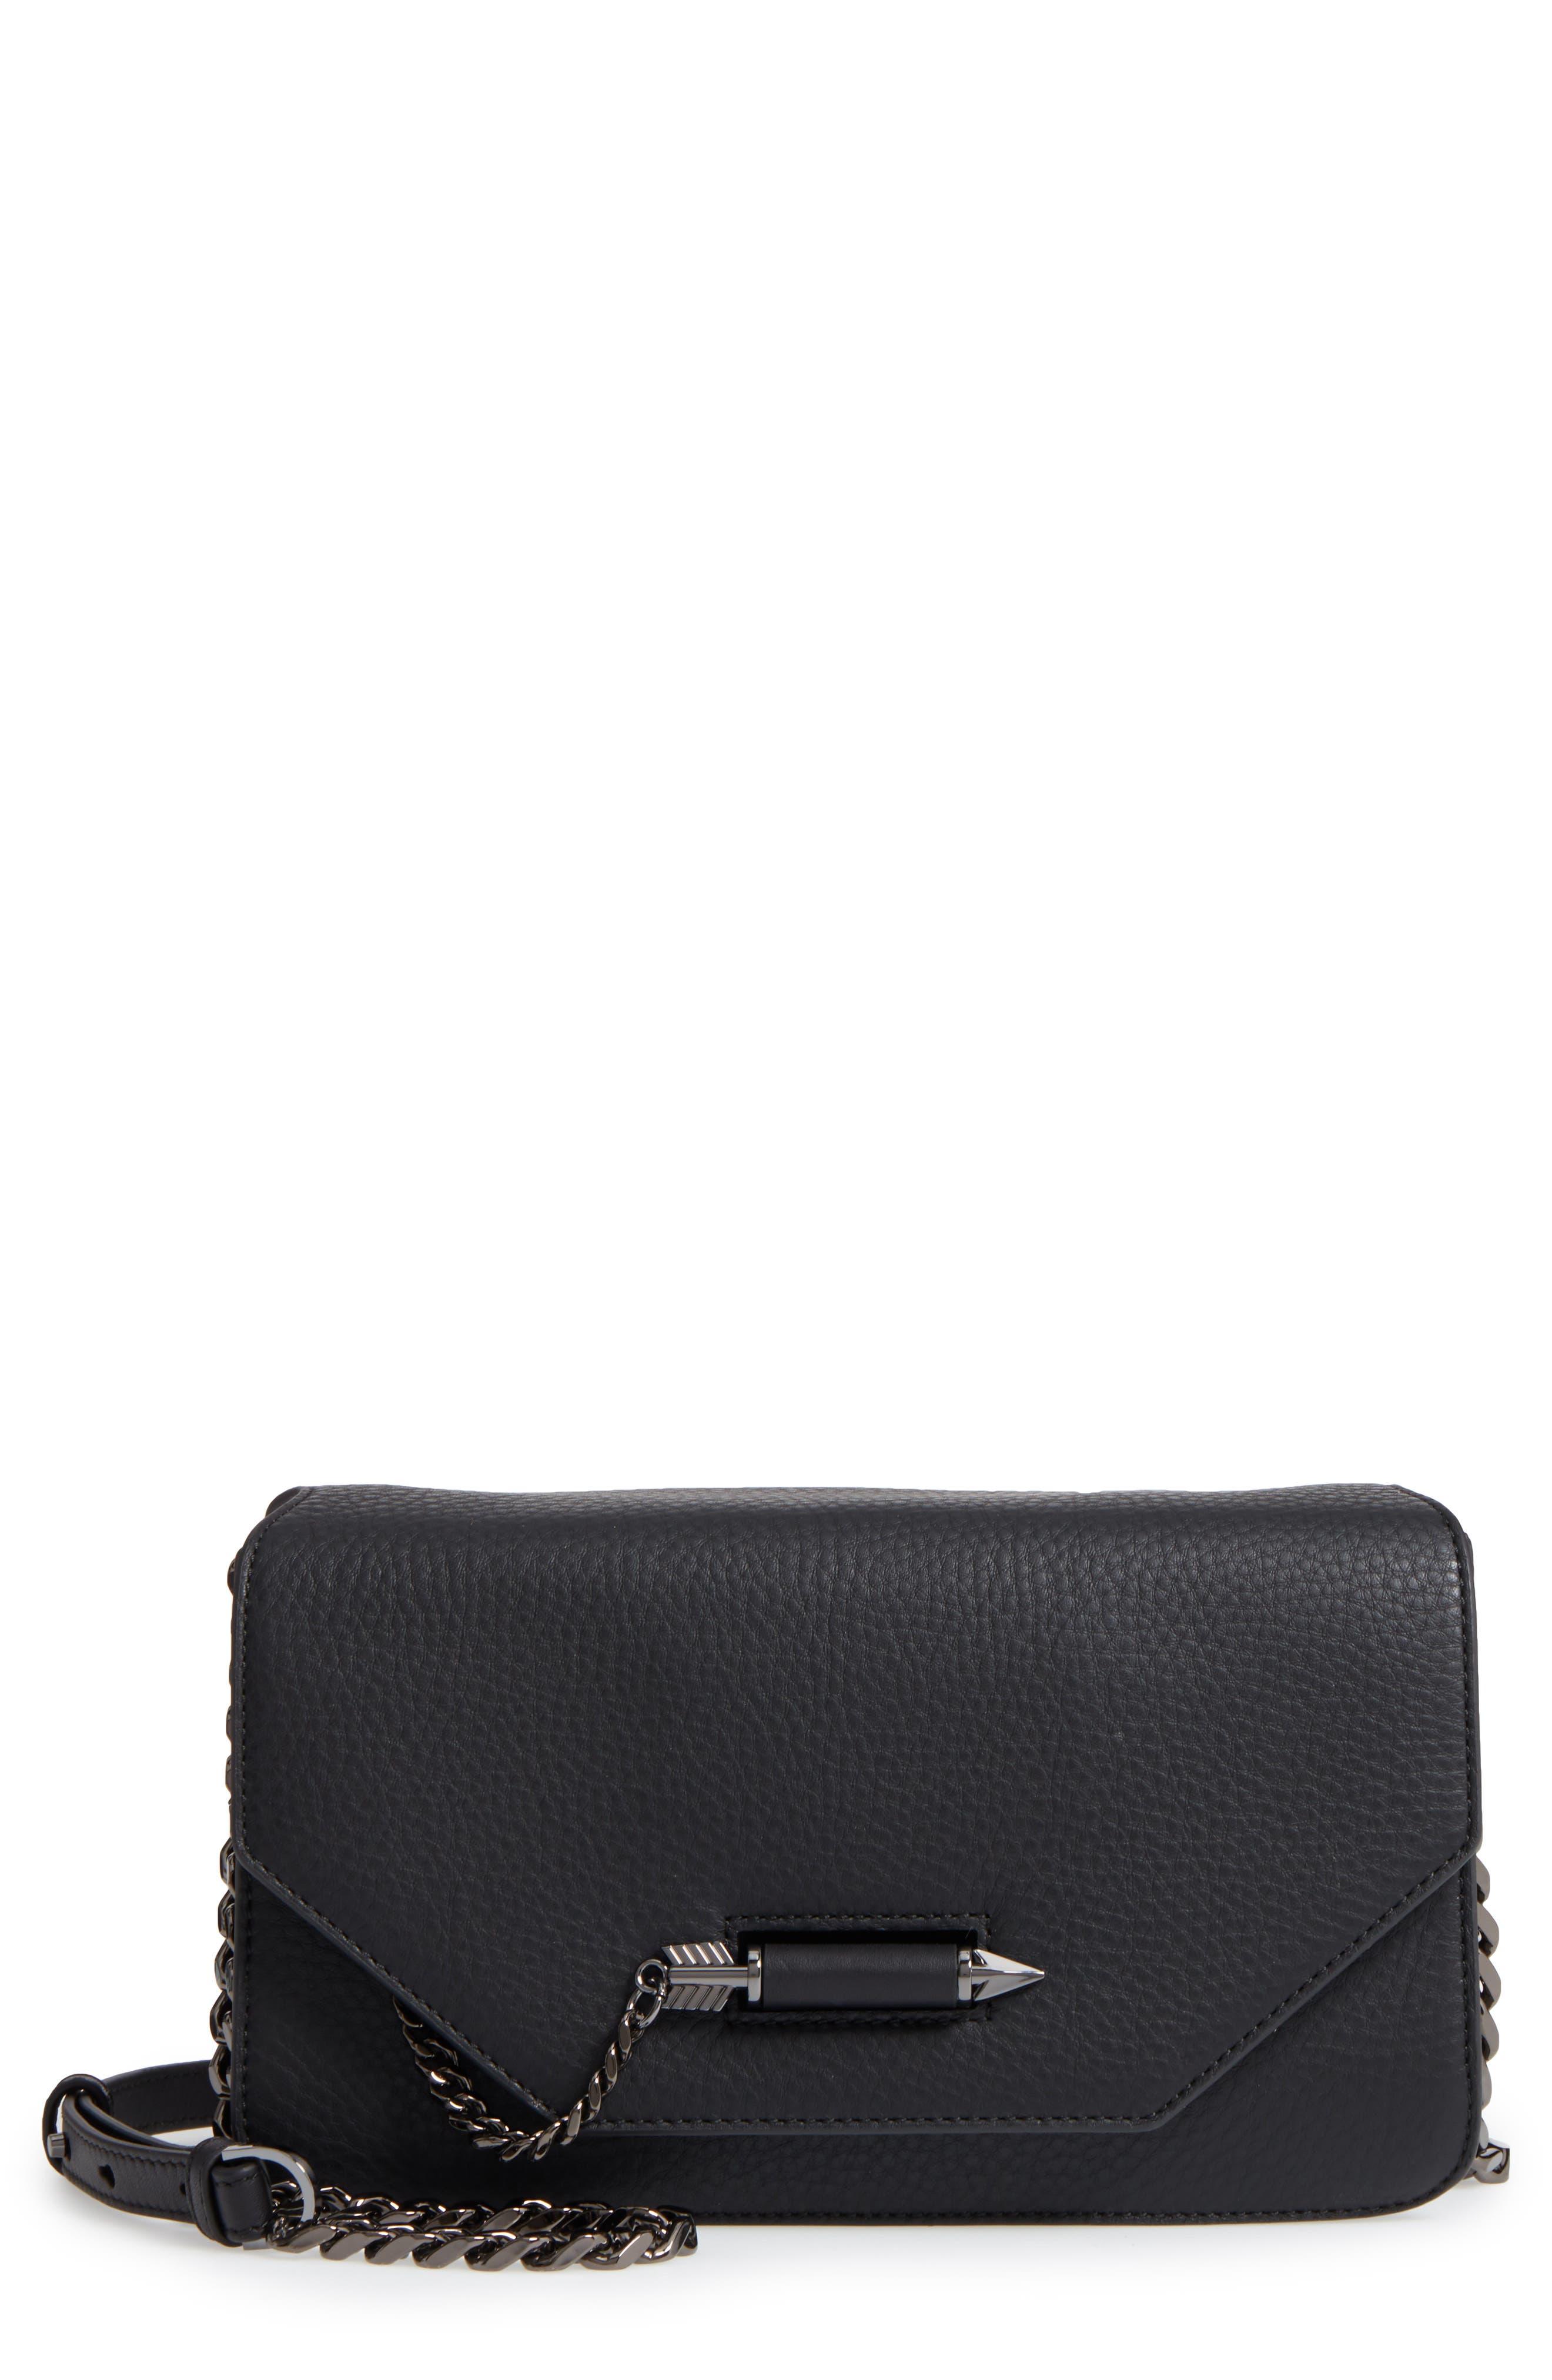 Cortney Nappa Leather Shoulder/Crossbody Bag,                         Main,                         color,